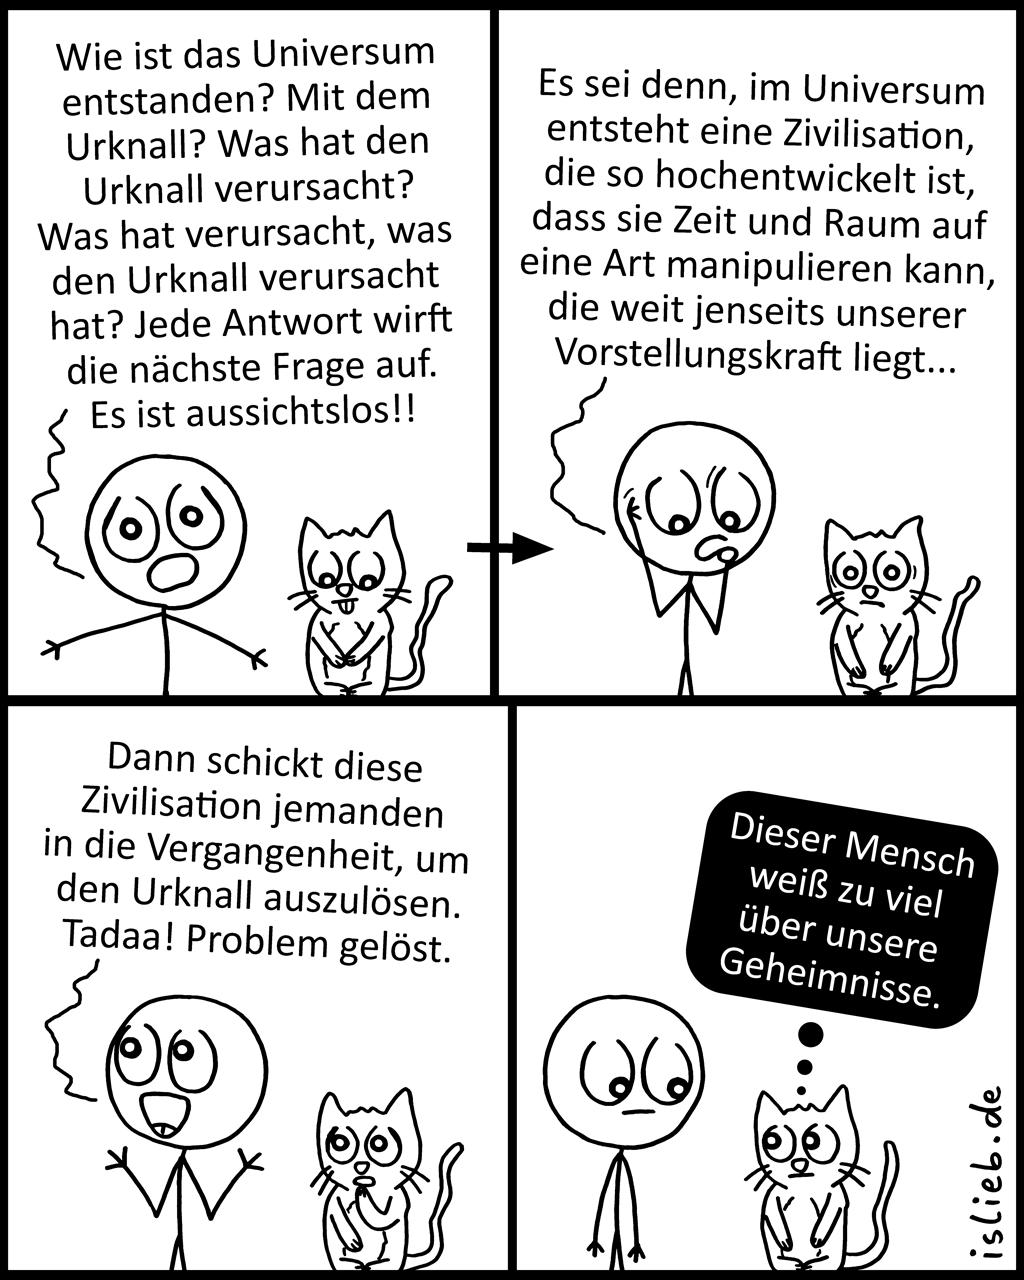 Ursprung | Urknall-Comic | is lieb?